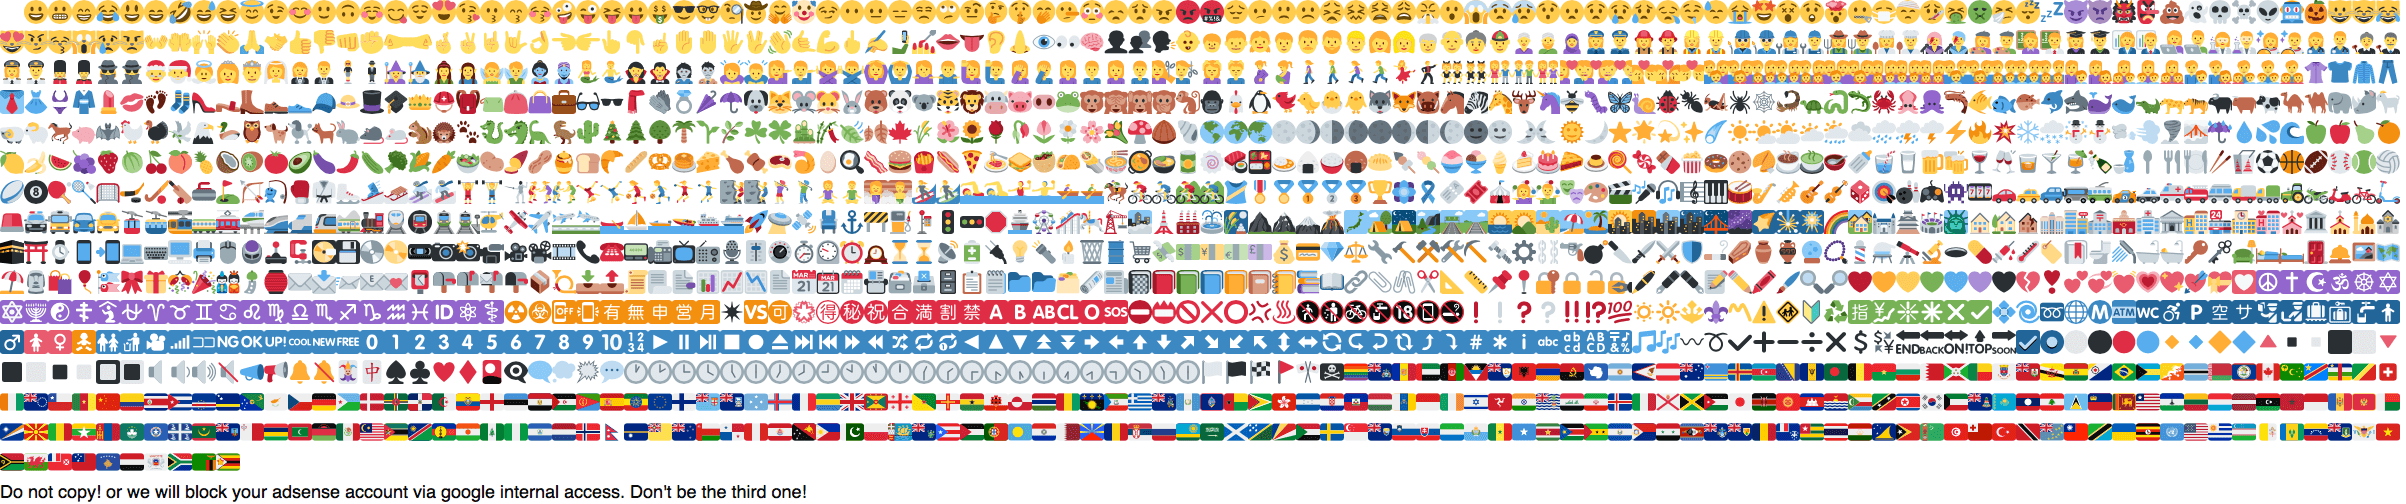 Emoji in Blog